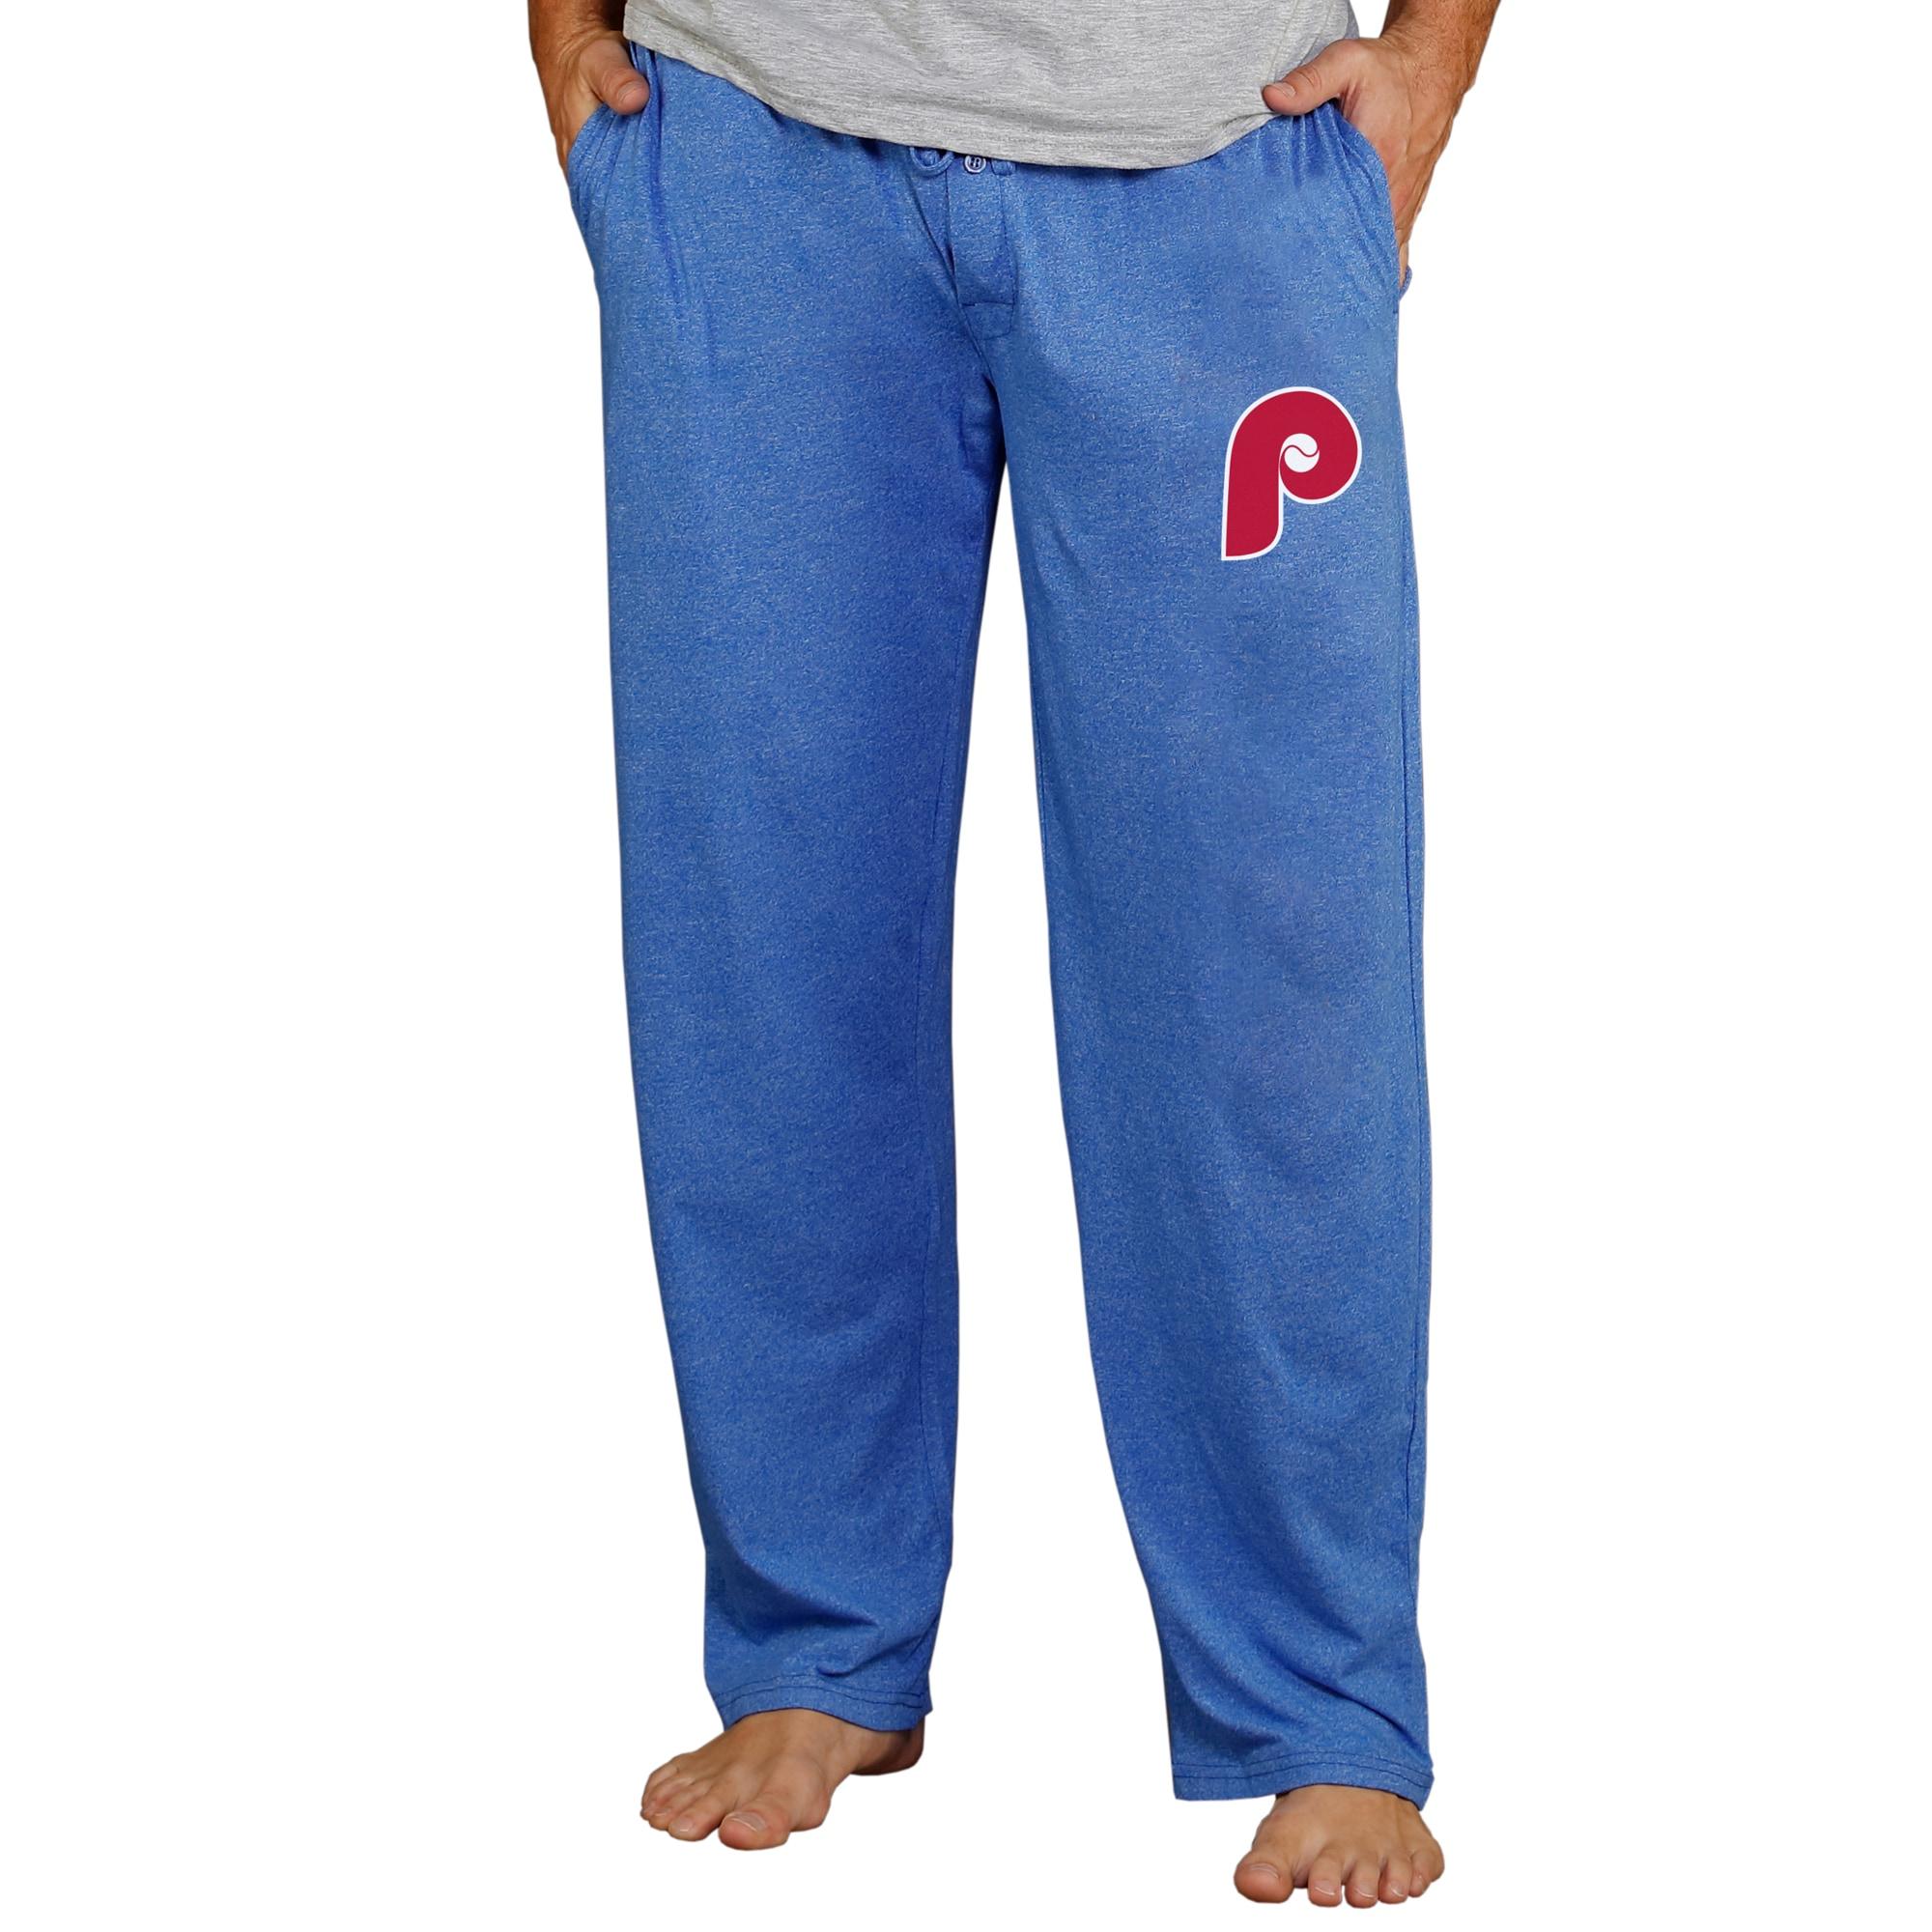 Philadelphia Phillies Concepts Sport Cooperstown Quest Lounge Pants - Royal